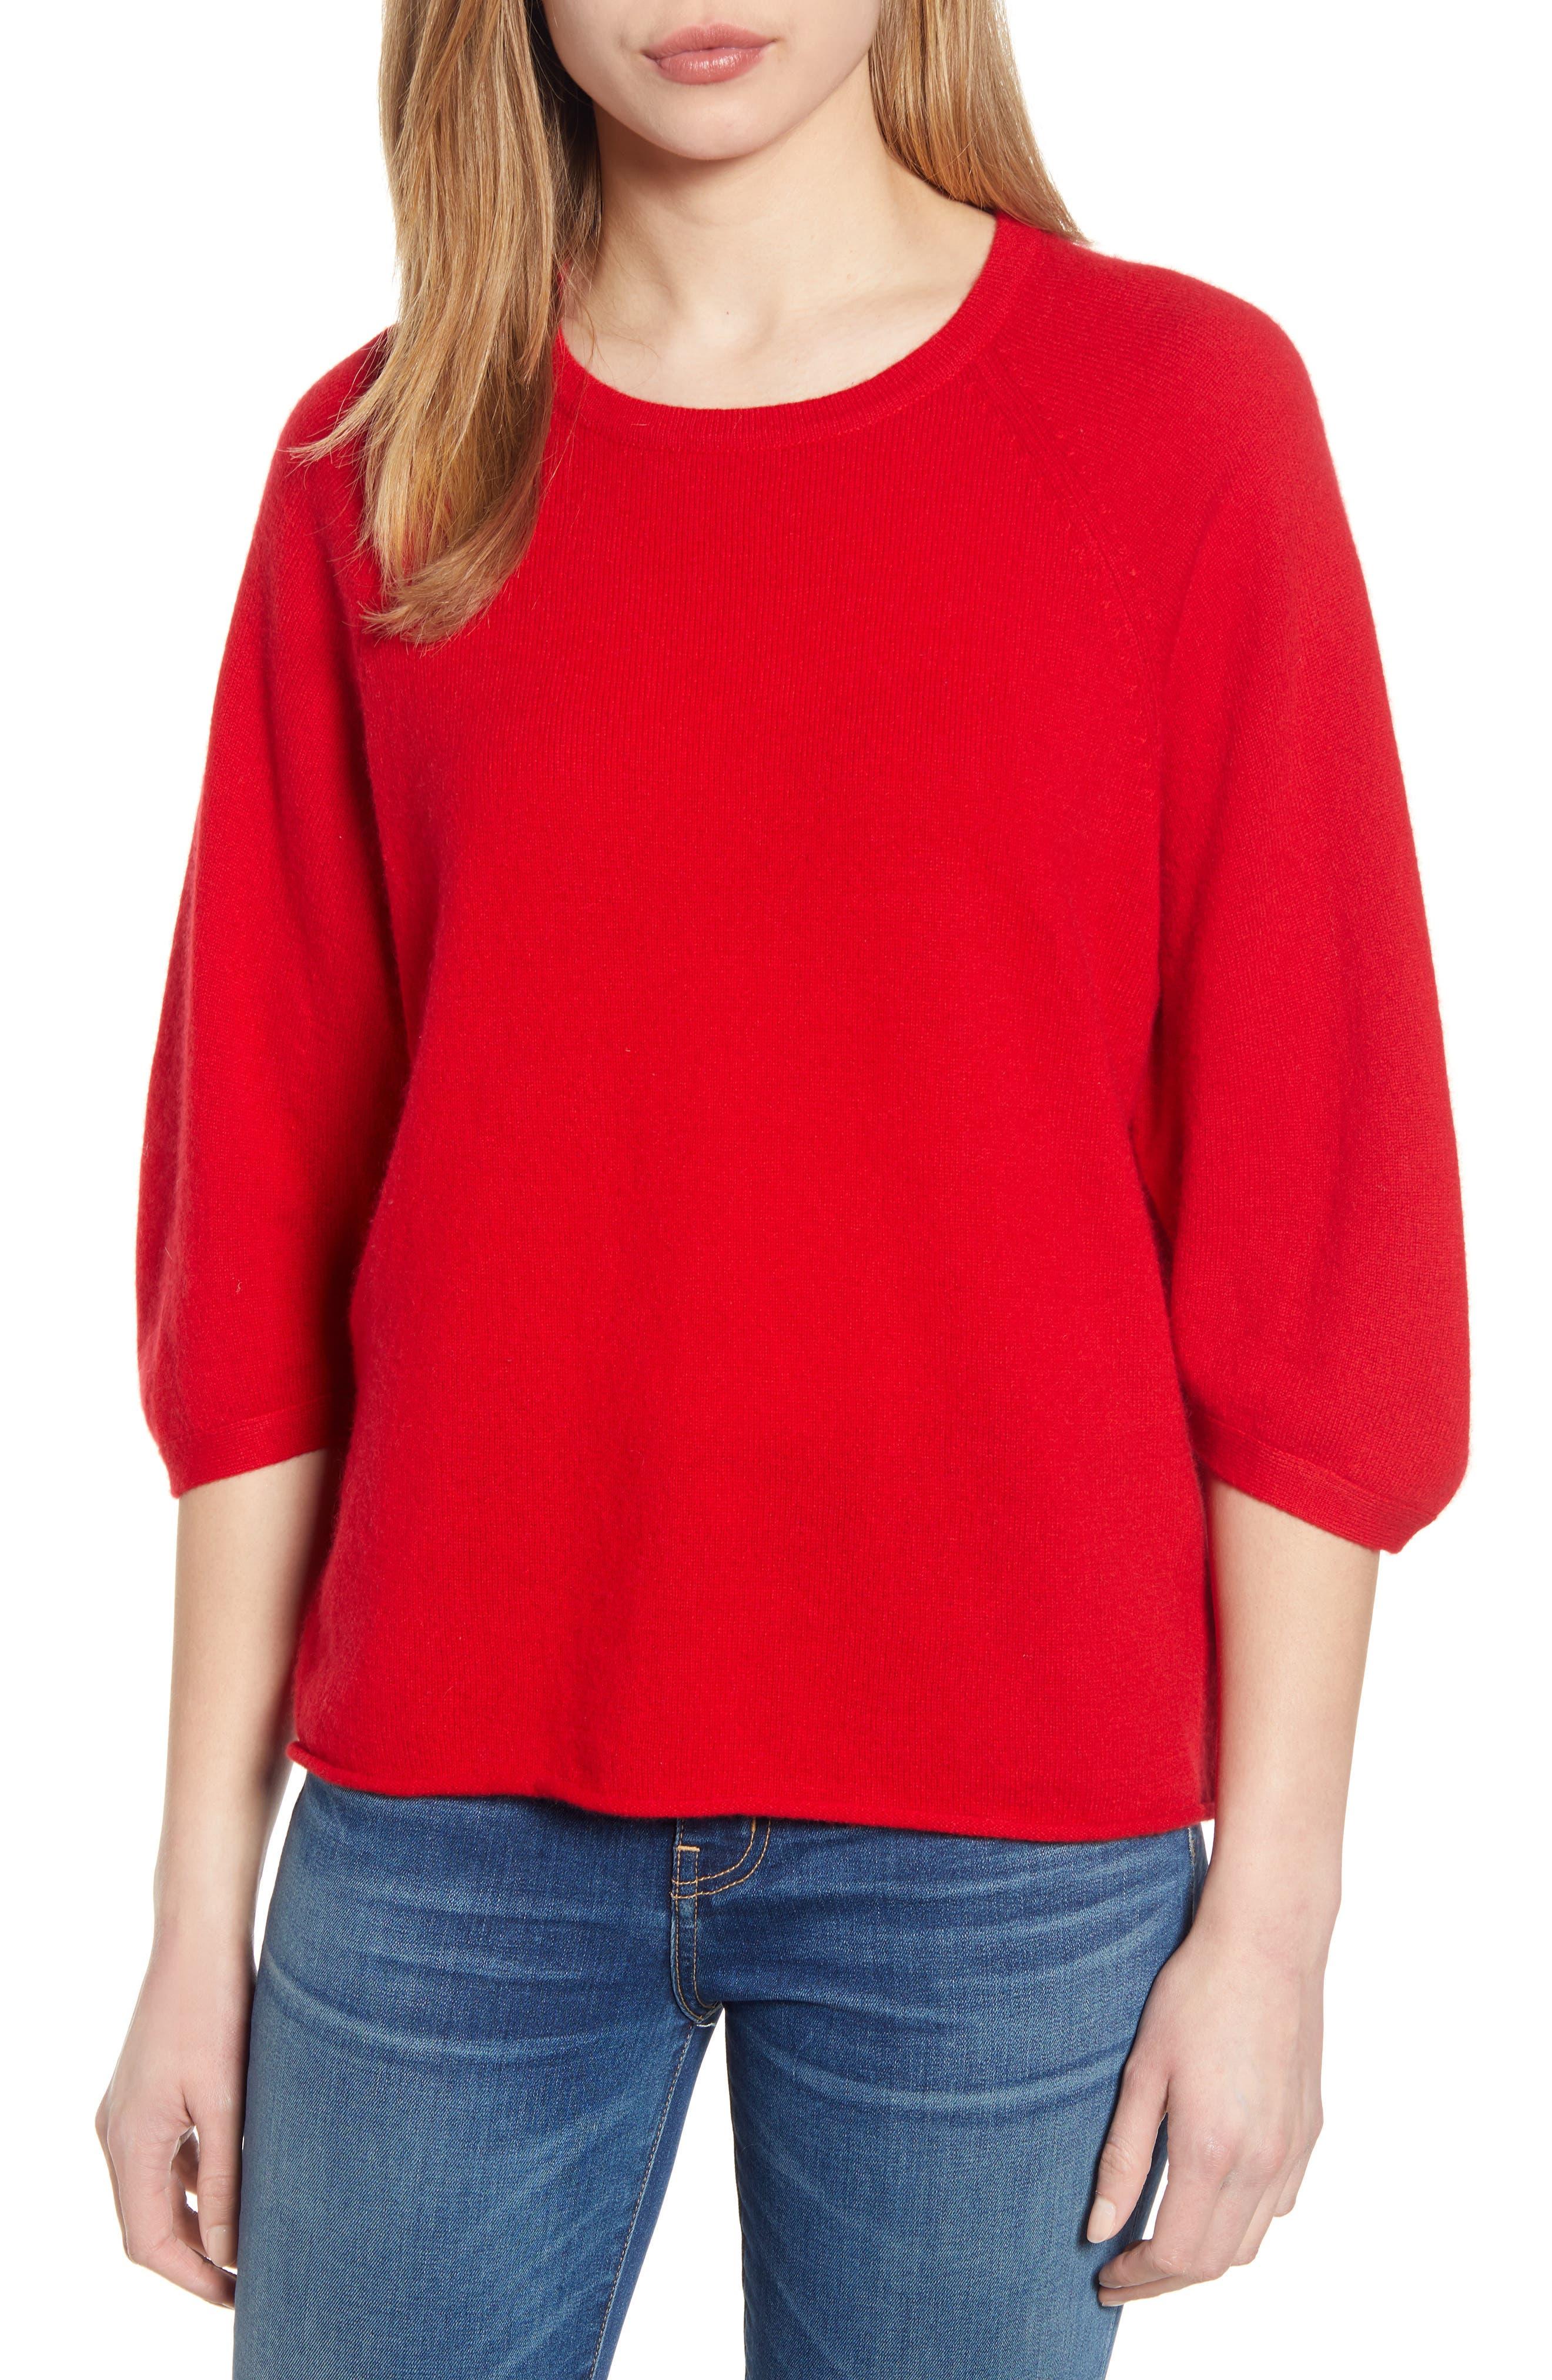 Velvet By Graham & Spencer Wool & Cashmere Sweater, Red